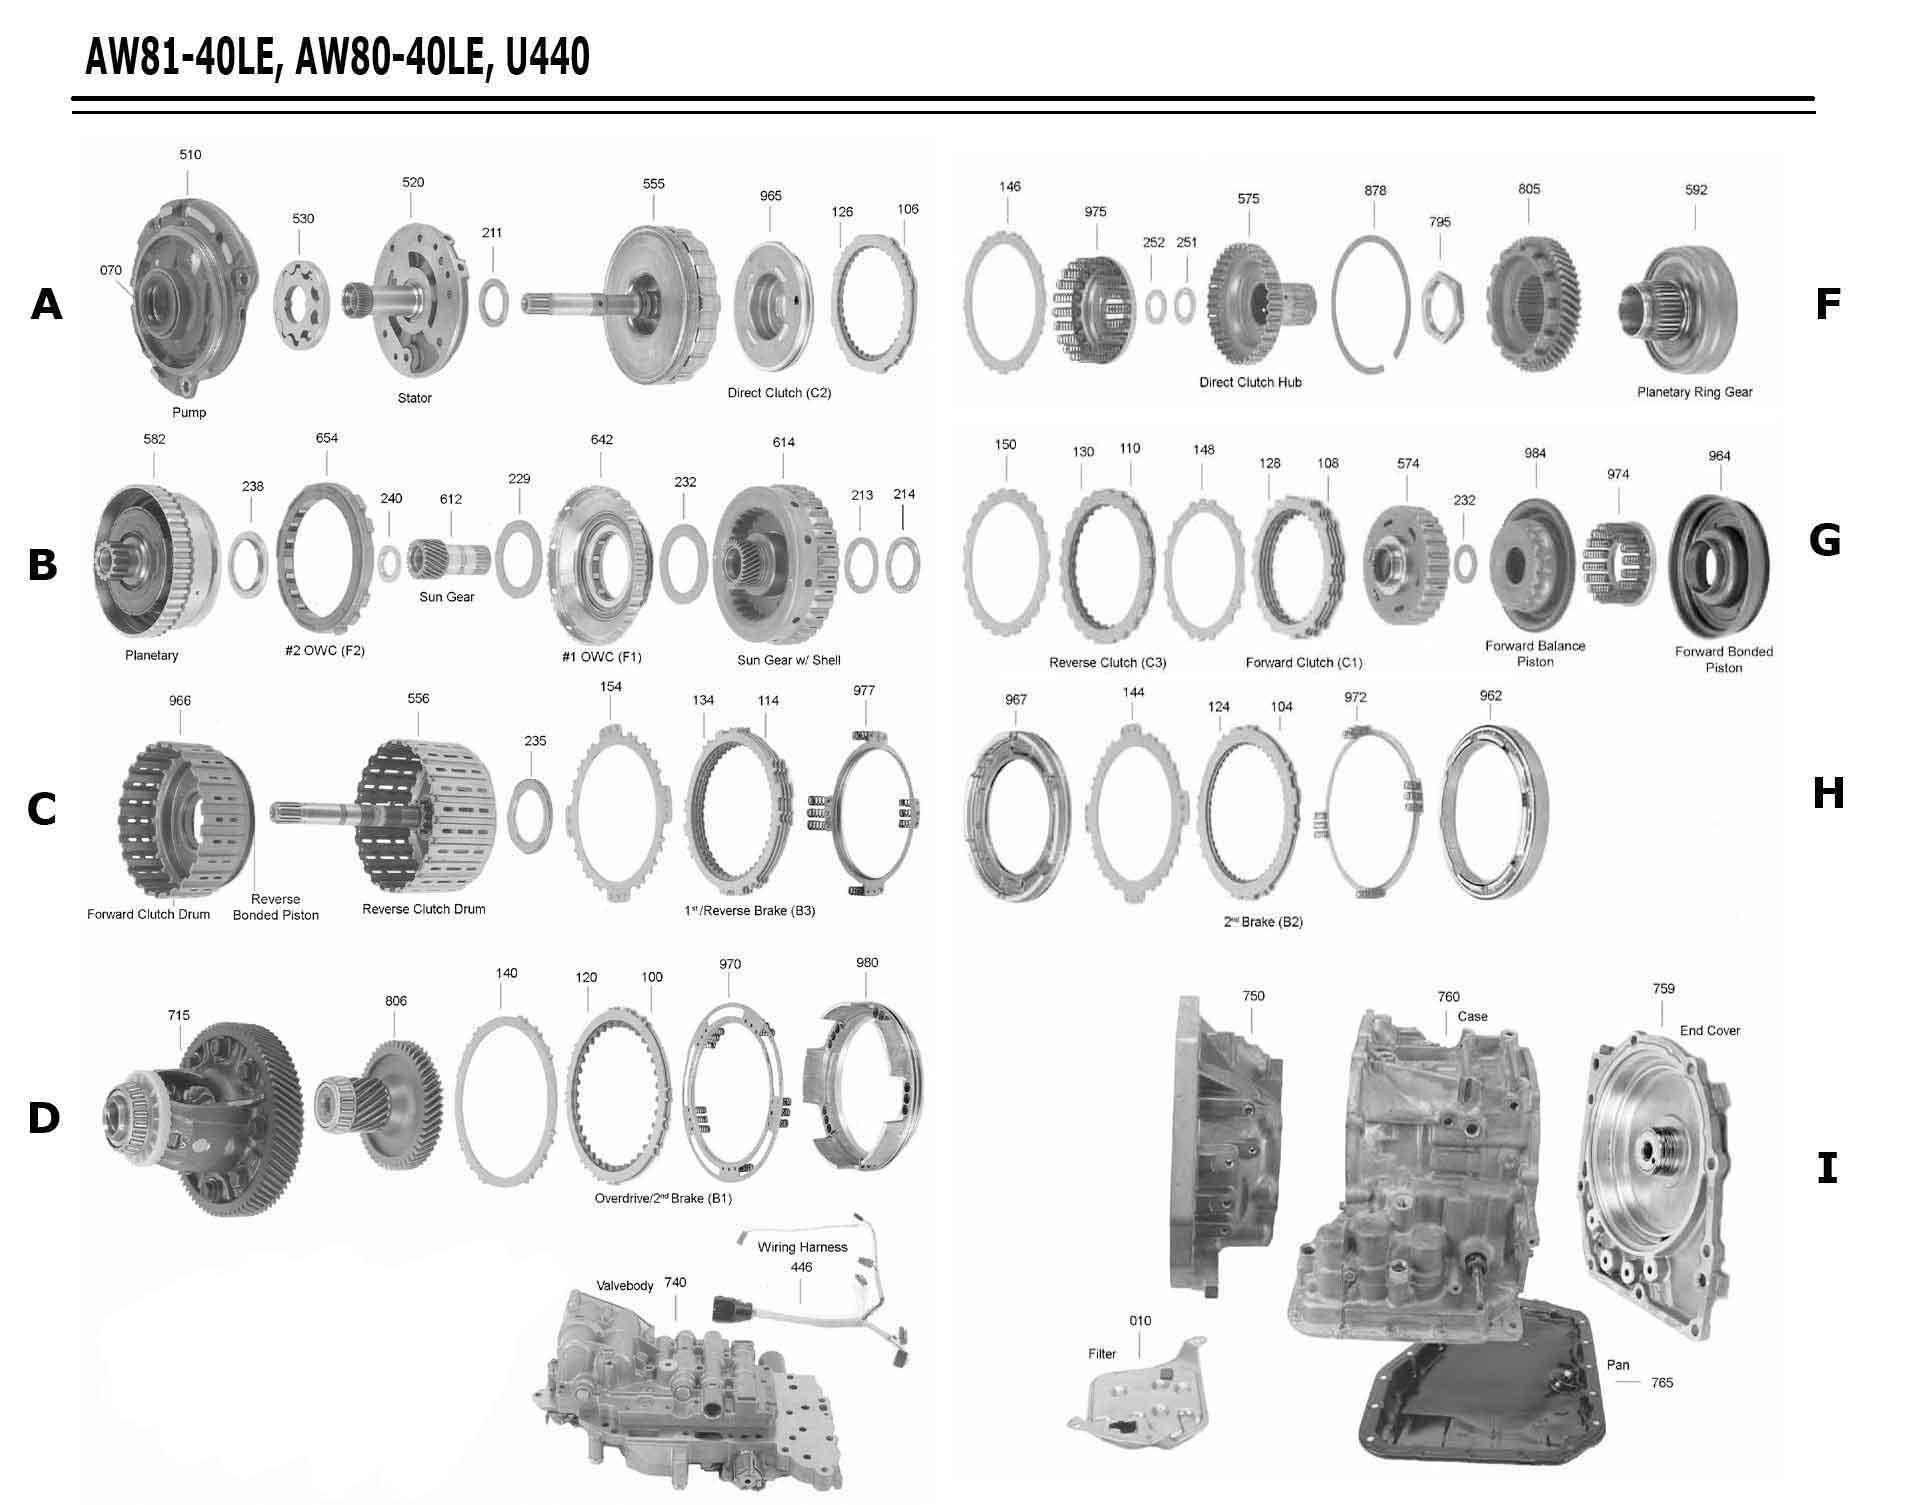 Transmission Repair Manuals U440e Aw80 81 40